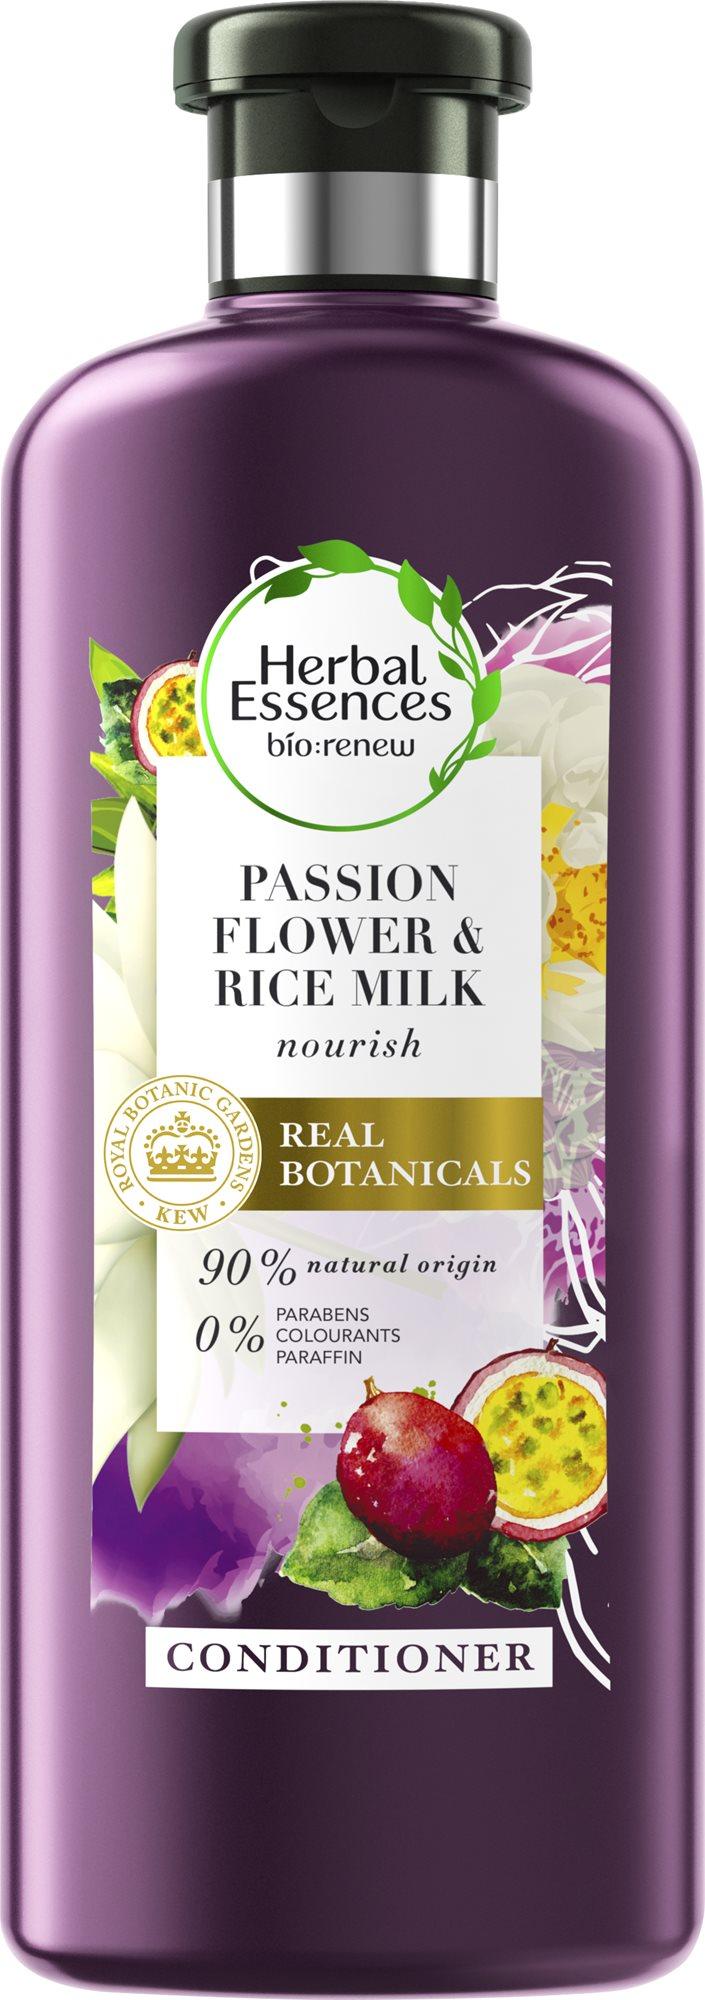 Herbal Essence Passion Flo Rice Milk 360 ml